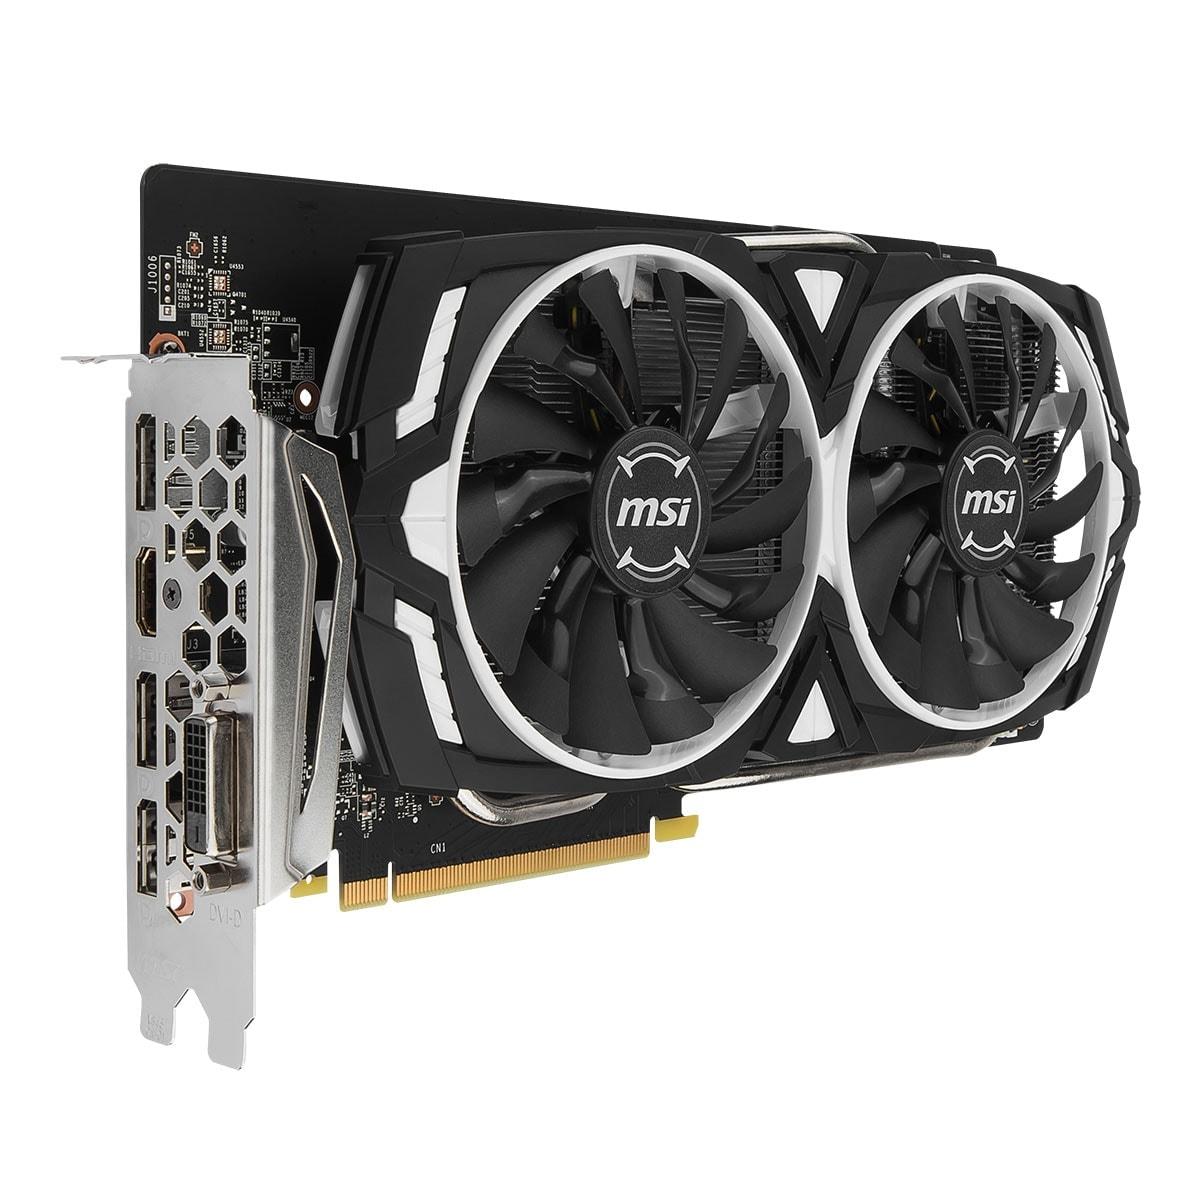 MSI GeForce GTX 1060 ARMOR 6G OC  (GTX 1060 ARMOR 6G OC --) - Achat / Vente Carte Graphique sur Cybertek.fr - 2